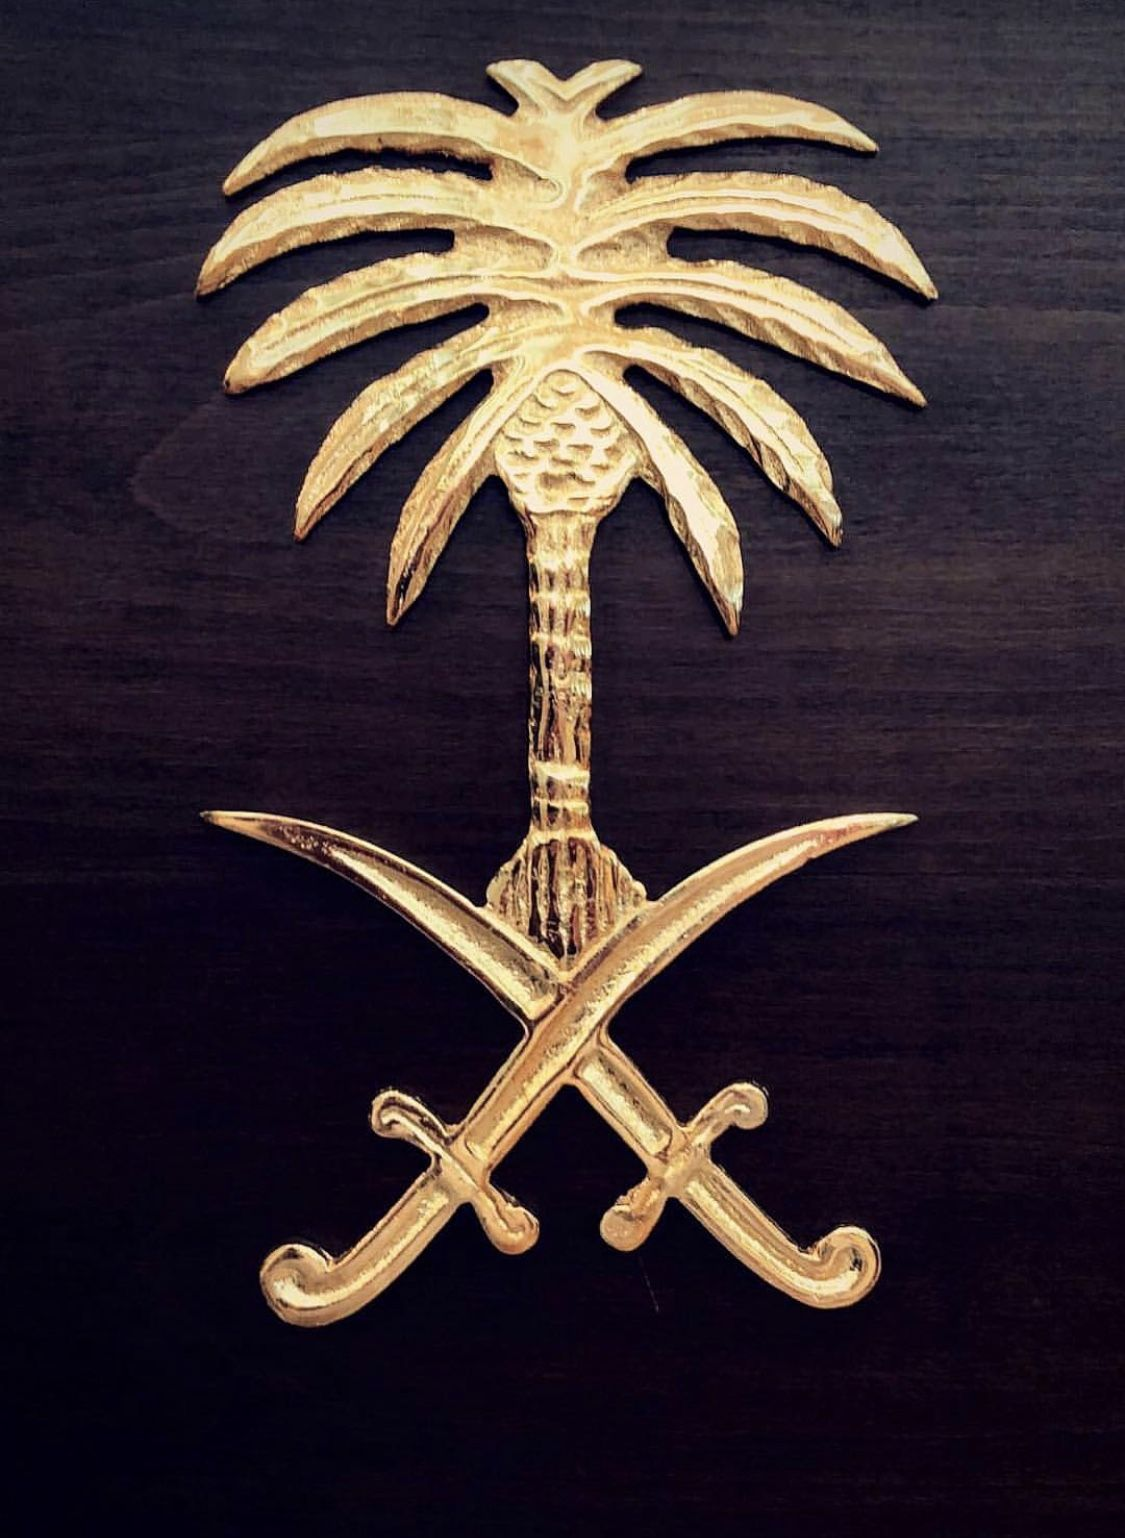 Pin By نبيل السربني On السعودية Saudi Arabia In 2019